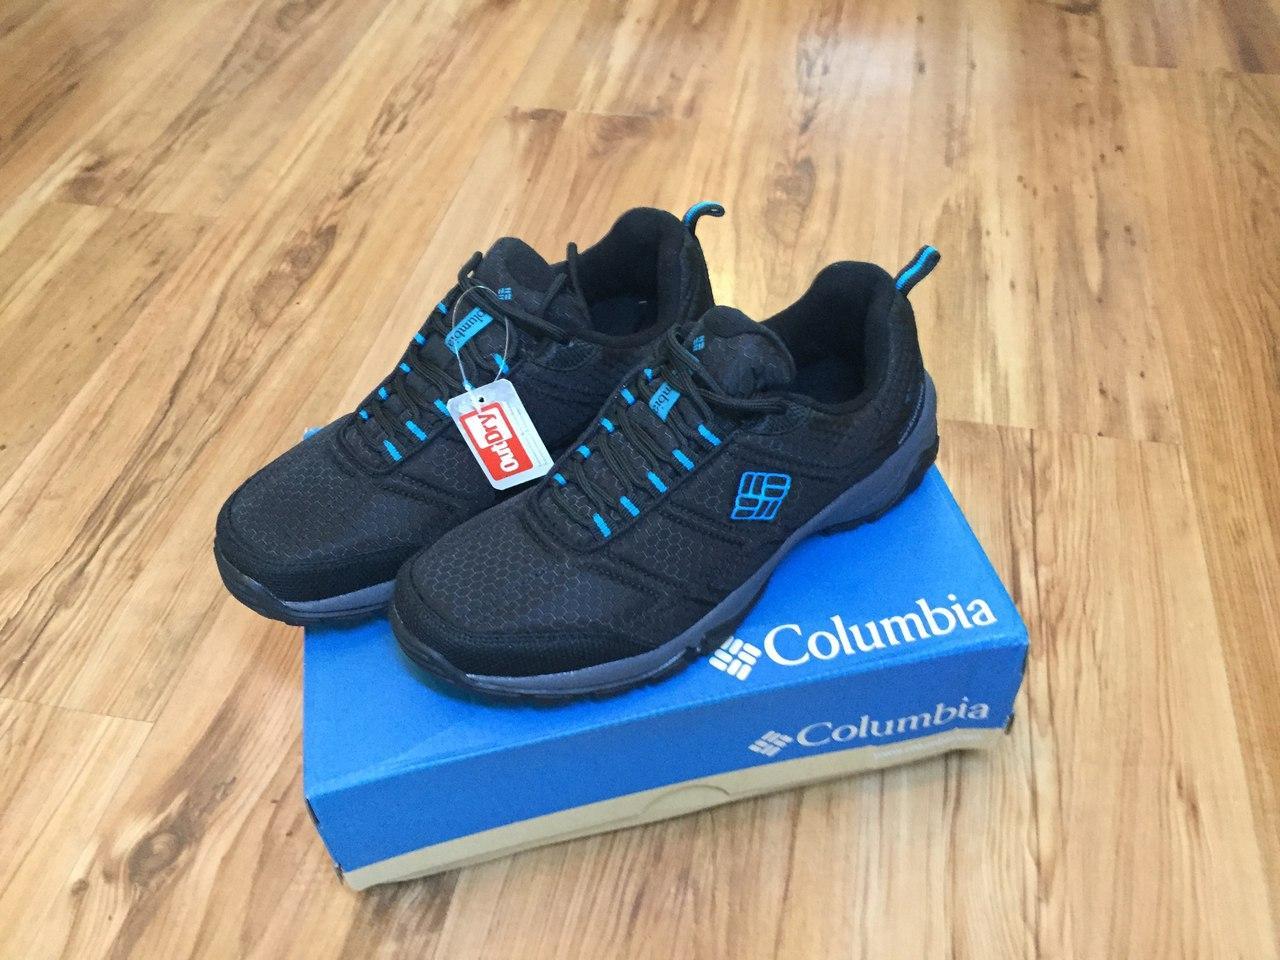 Мужские ботинки, кроссовки Columbia-термо